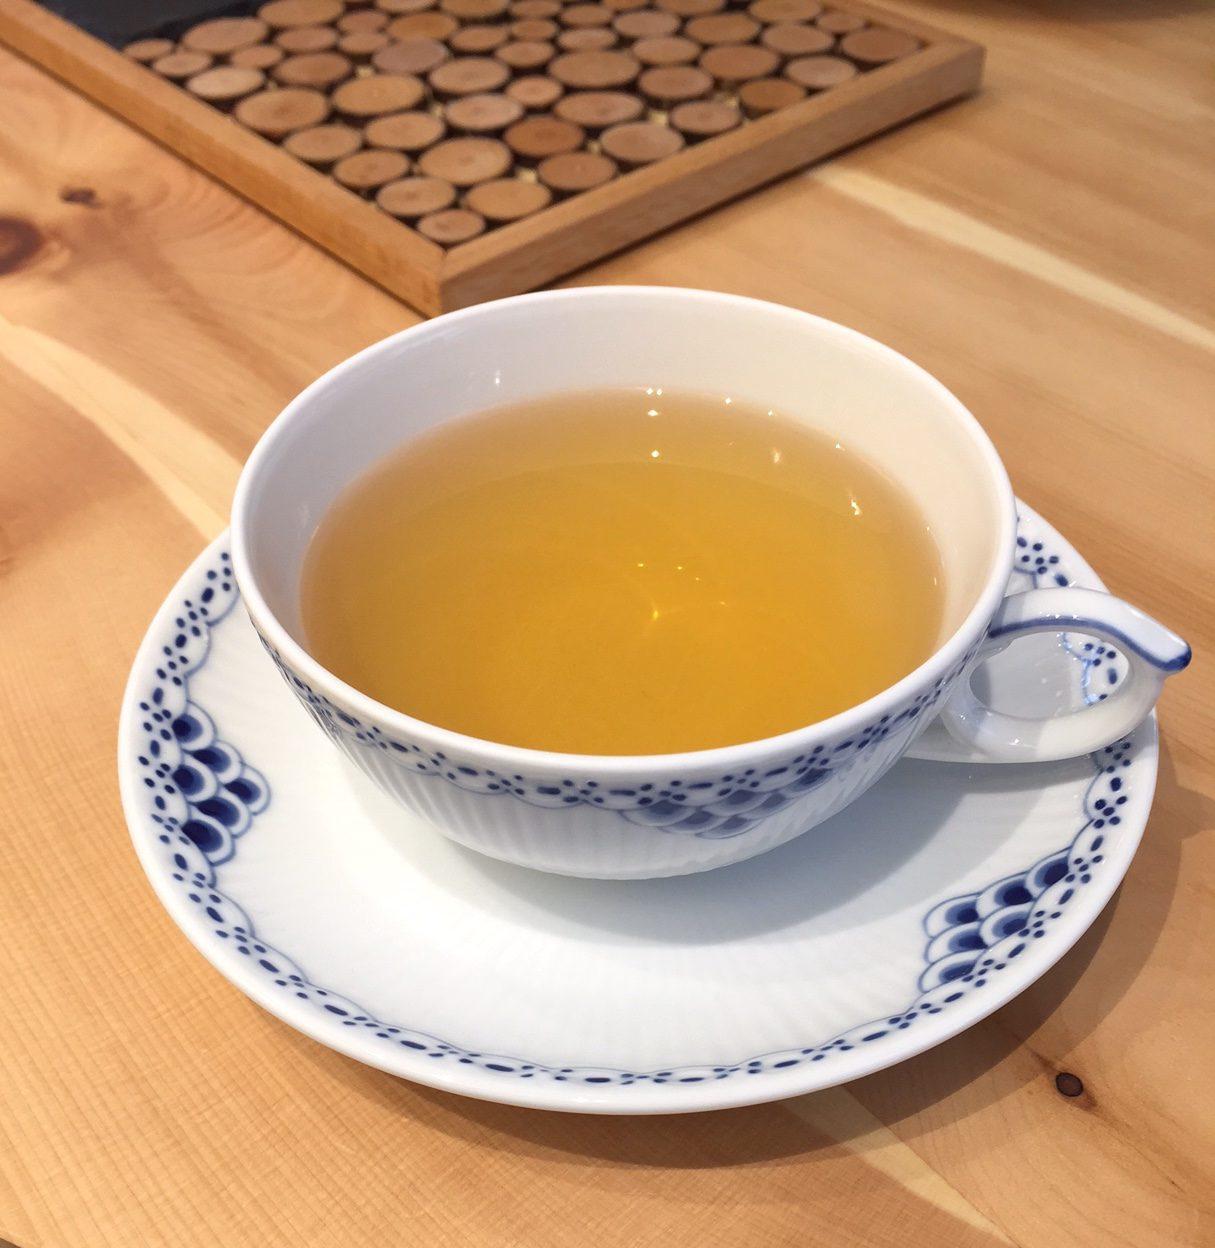 Probiertage im Februar: Tee, Süßes und Pikantes